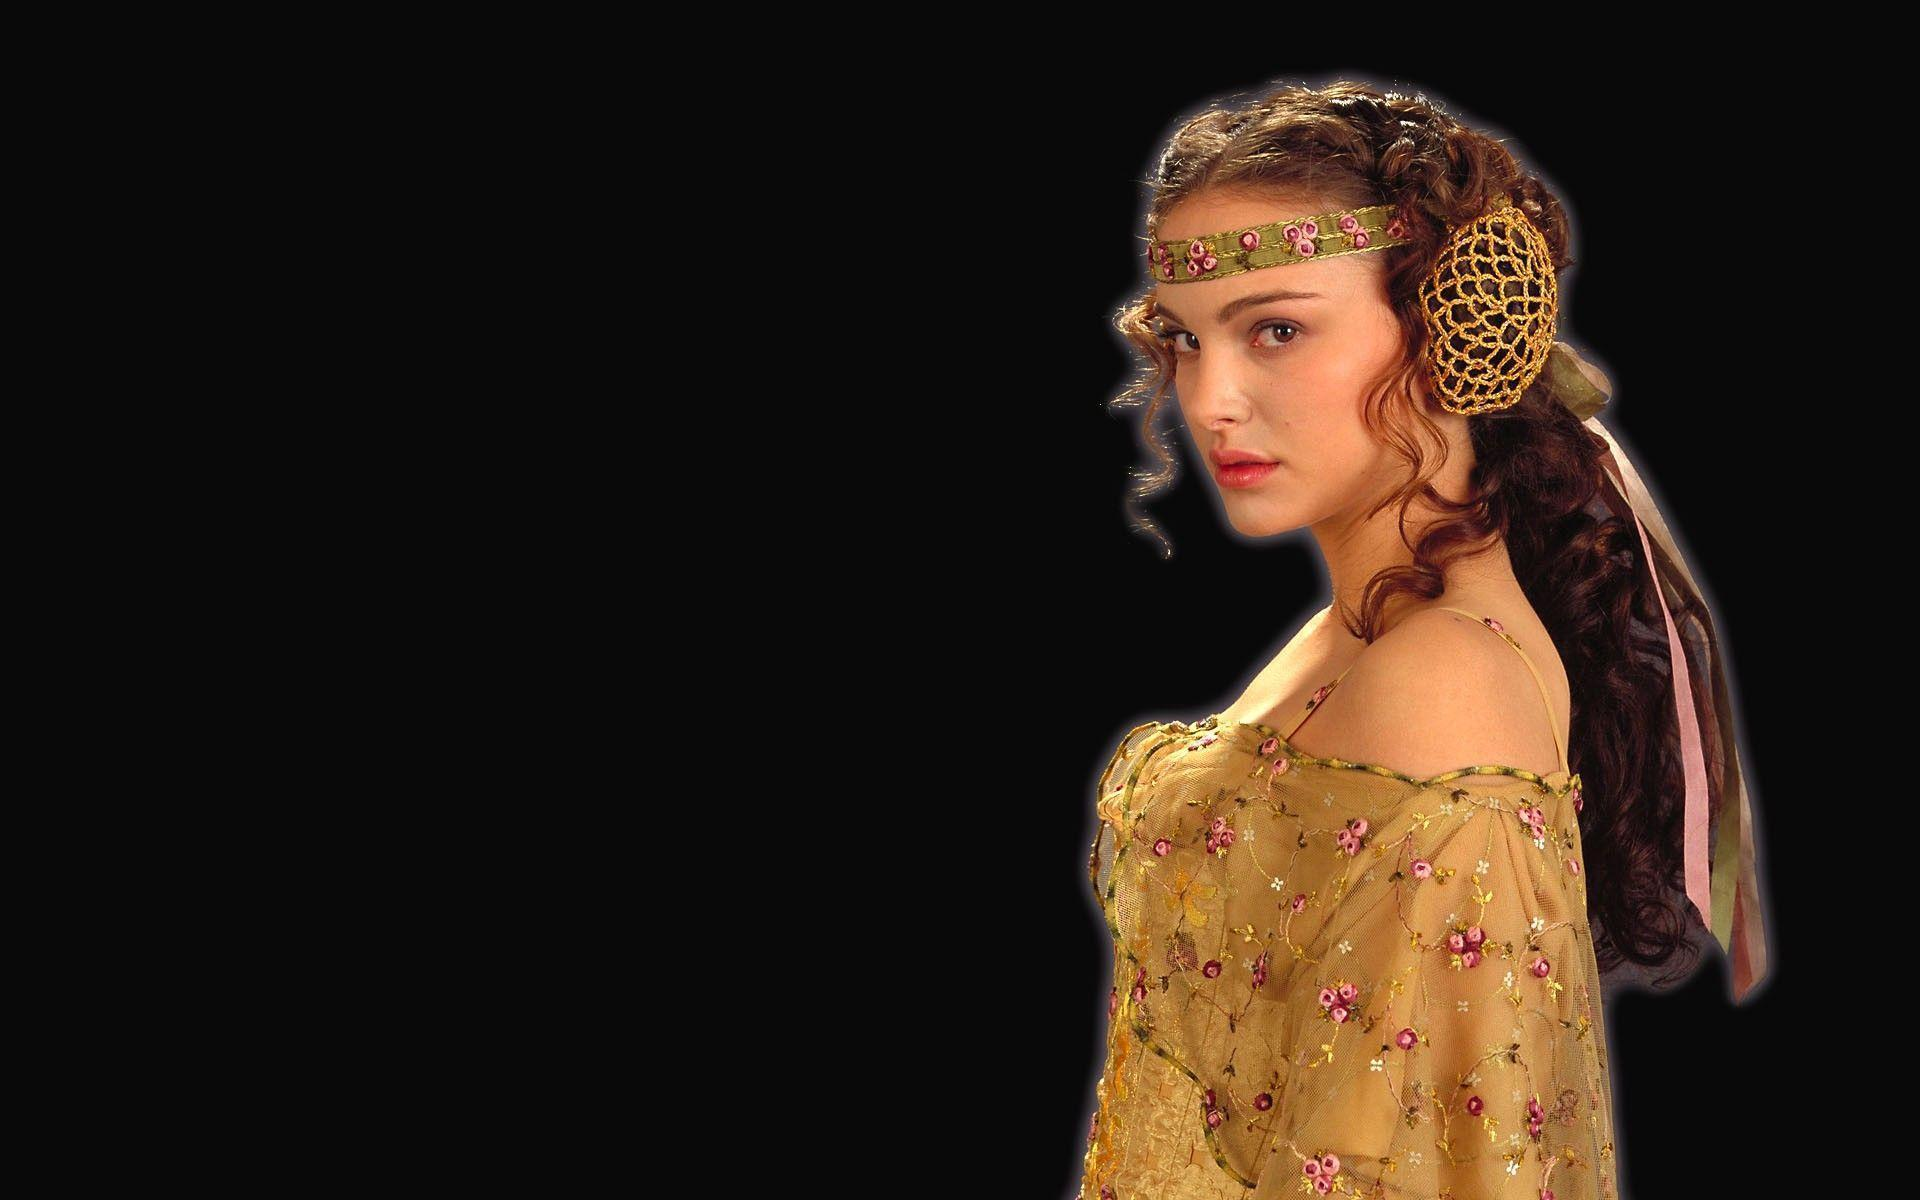 Натали Портман Принцесса